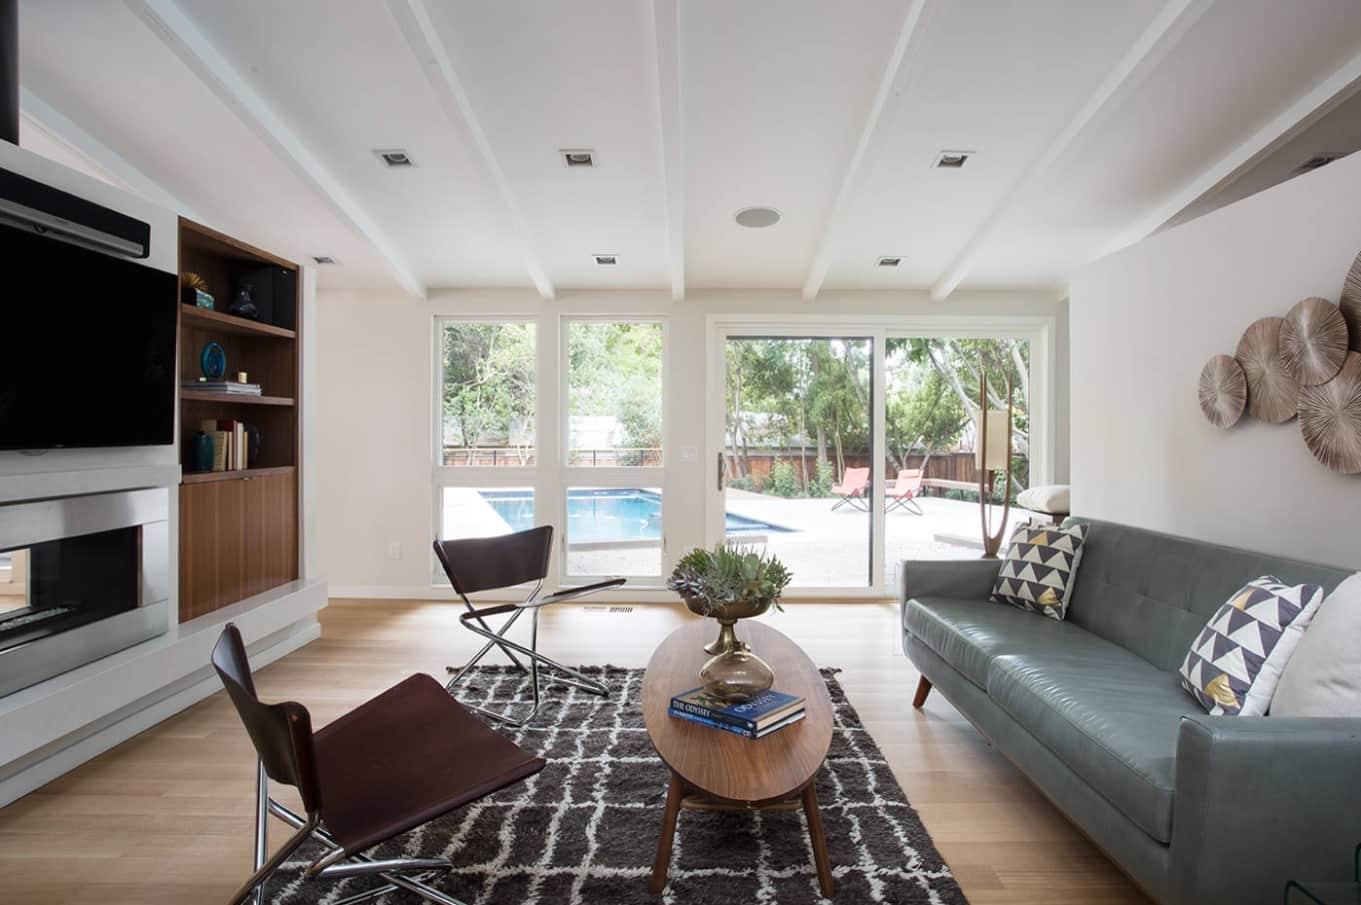 Great sunroom living design with minimalistic setting